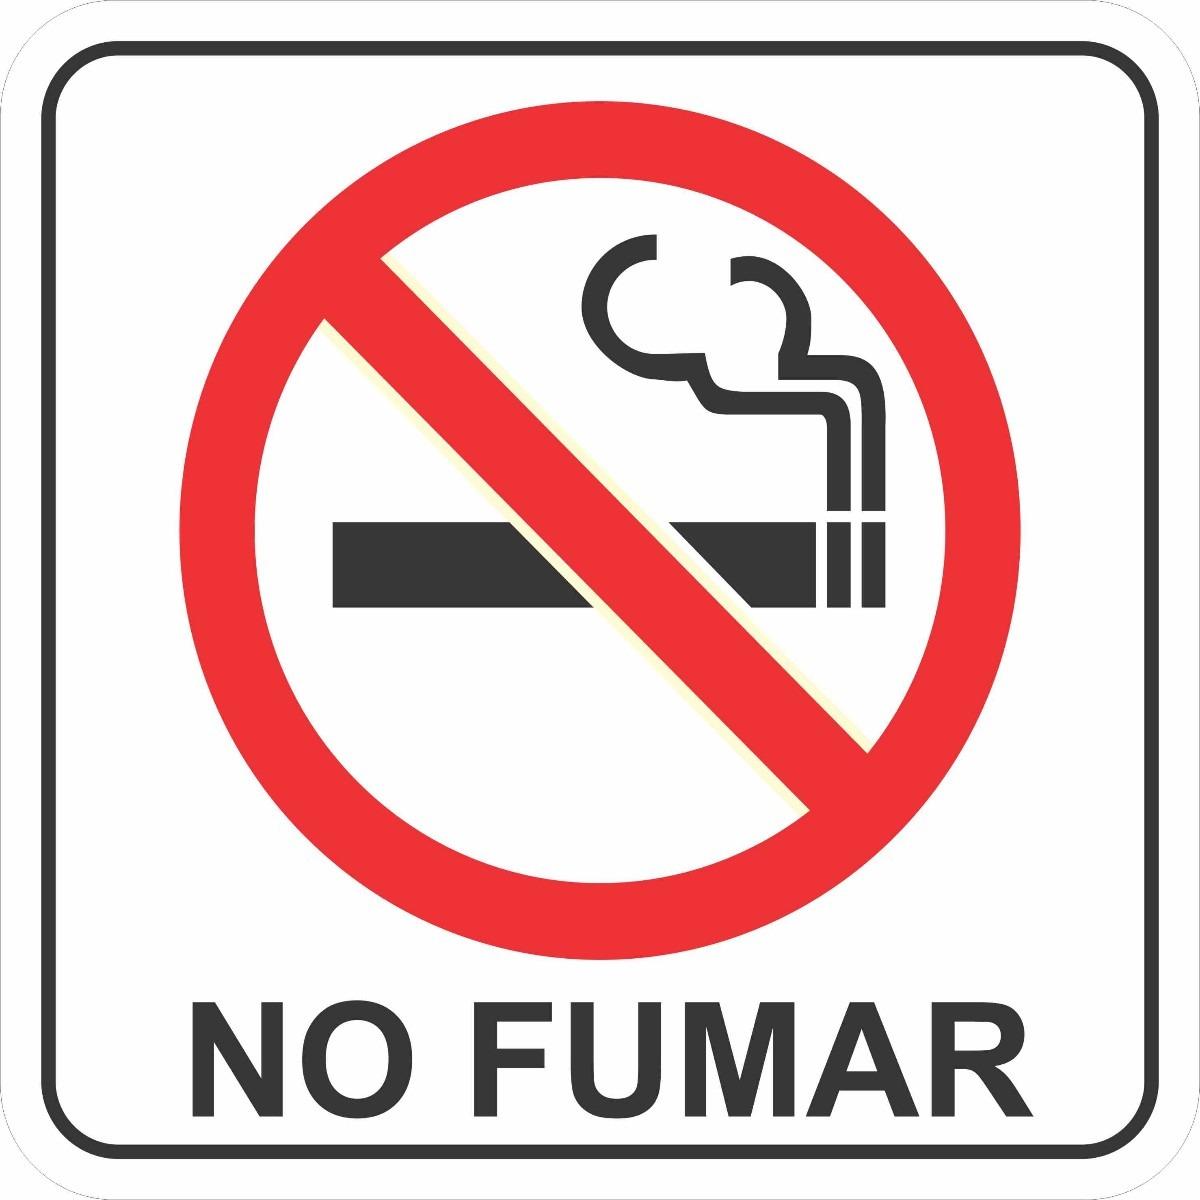 C mo comunicar una prohibici n de manera efectiva prevenblog for Cuarto dia sin fumar